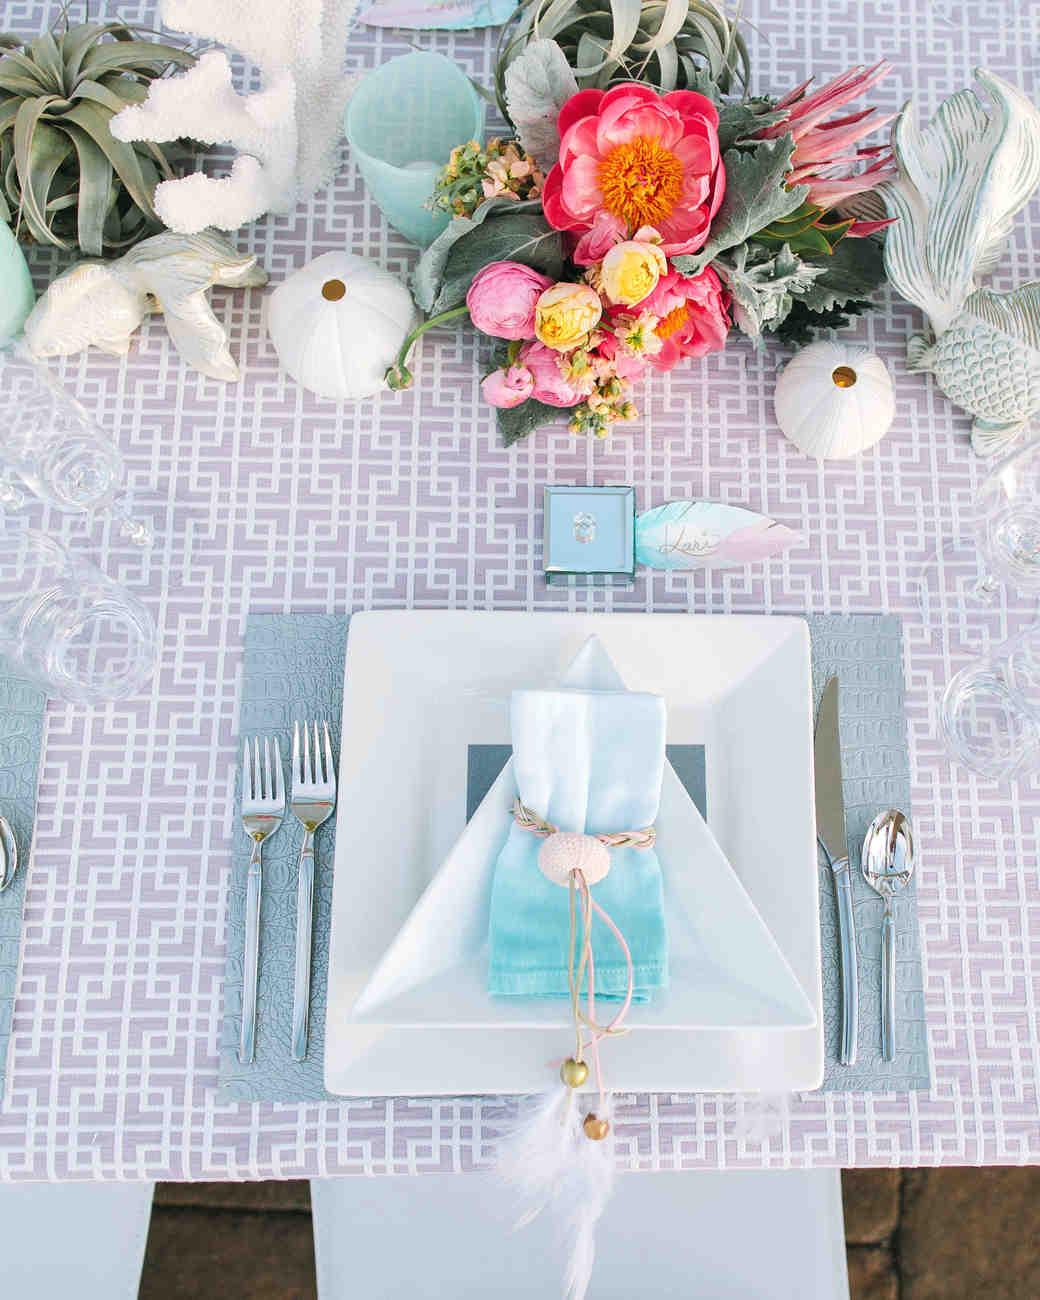 kari-charlie-wedding-placesetting-0314.jpg